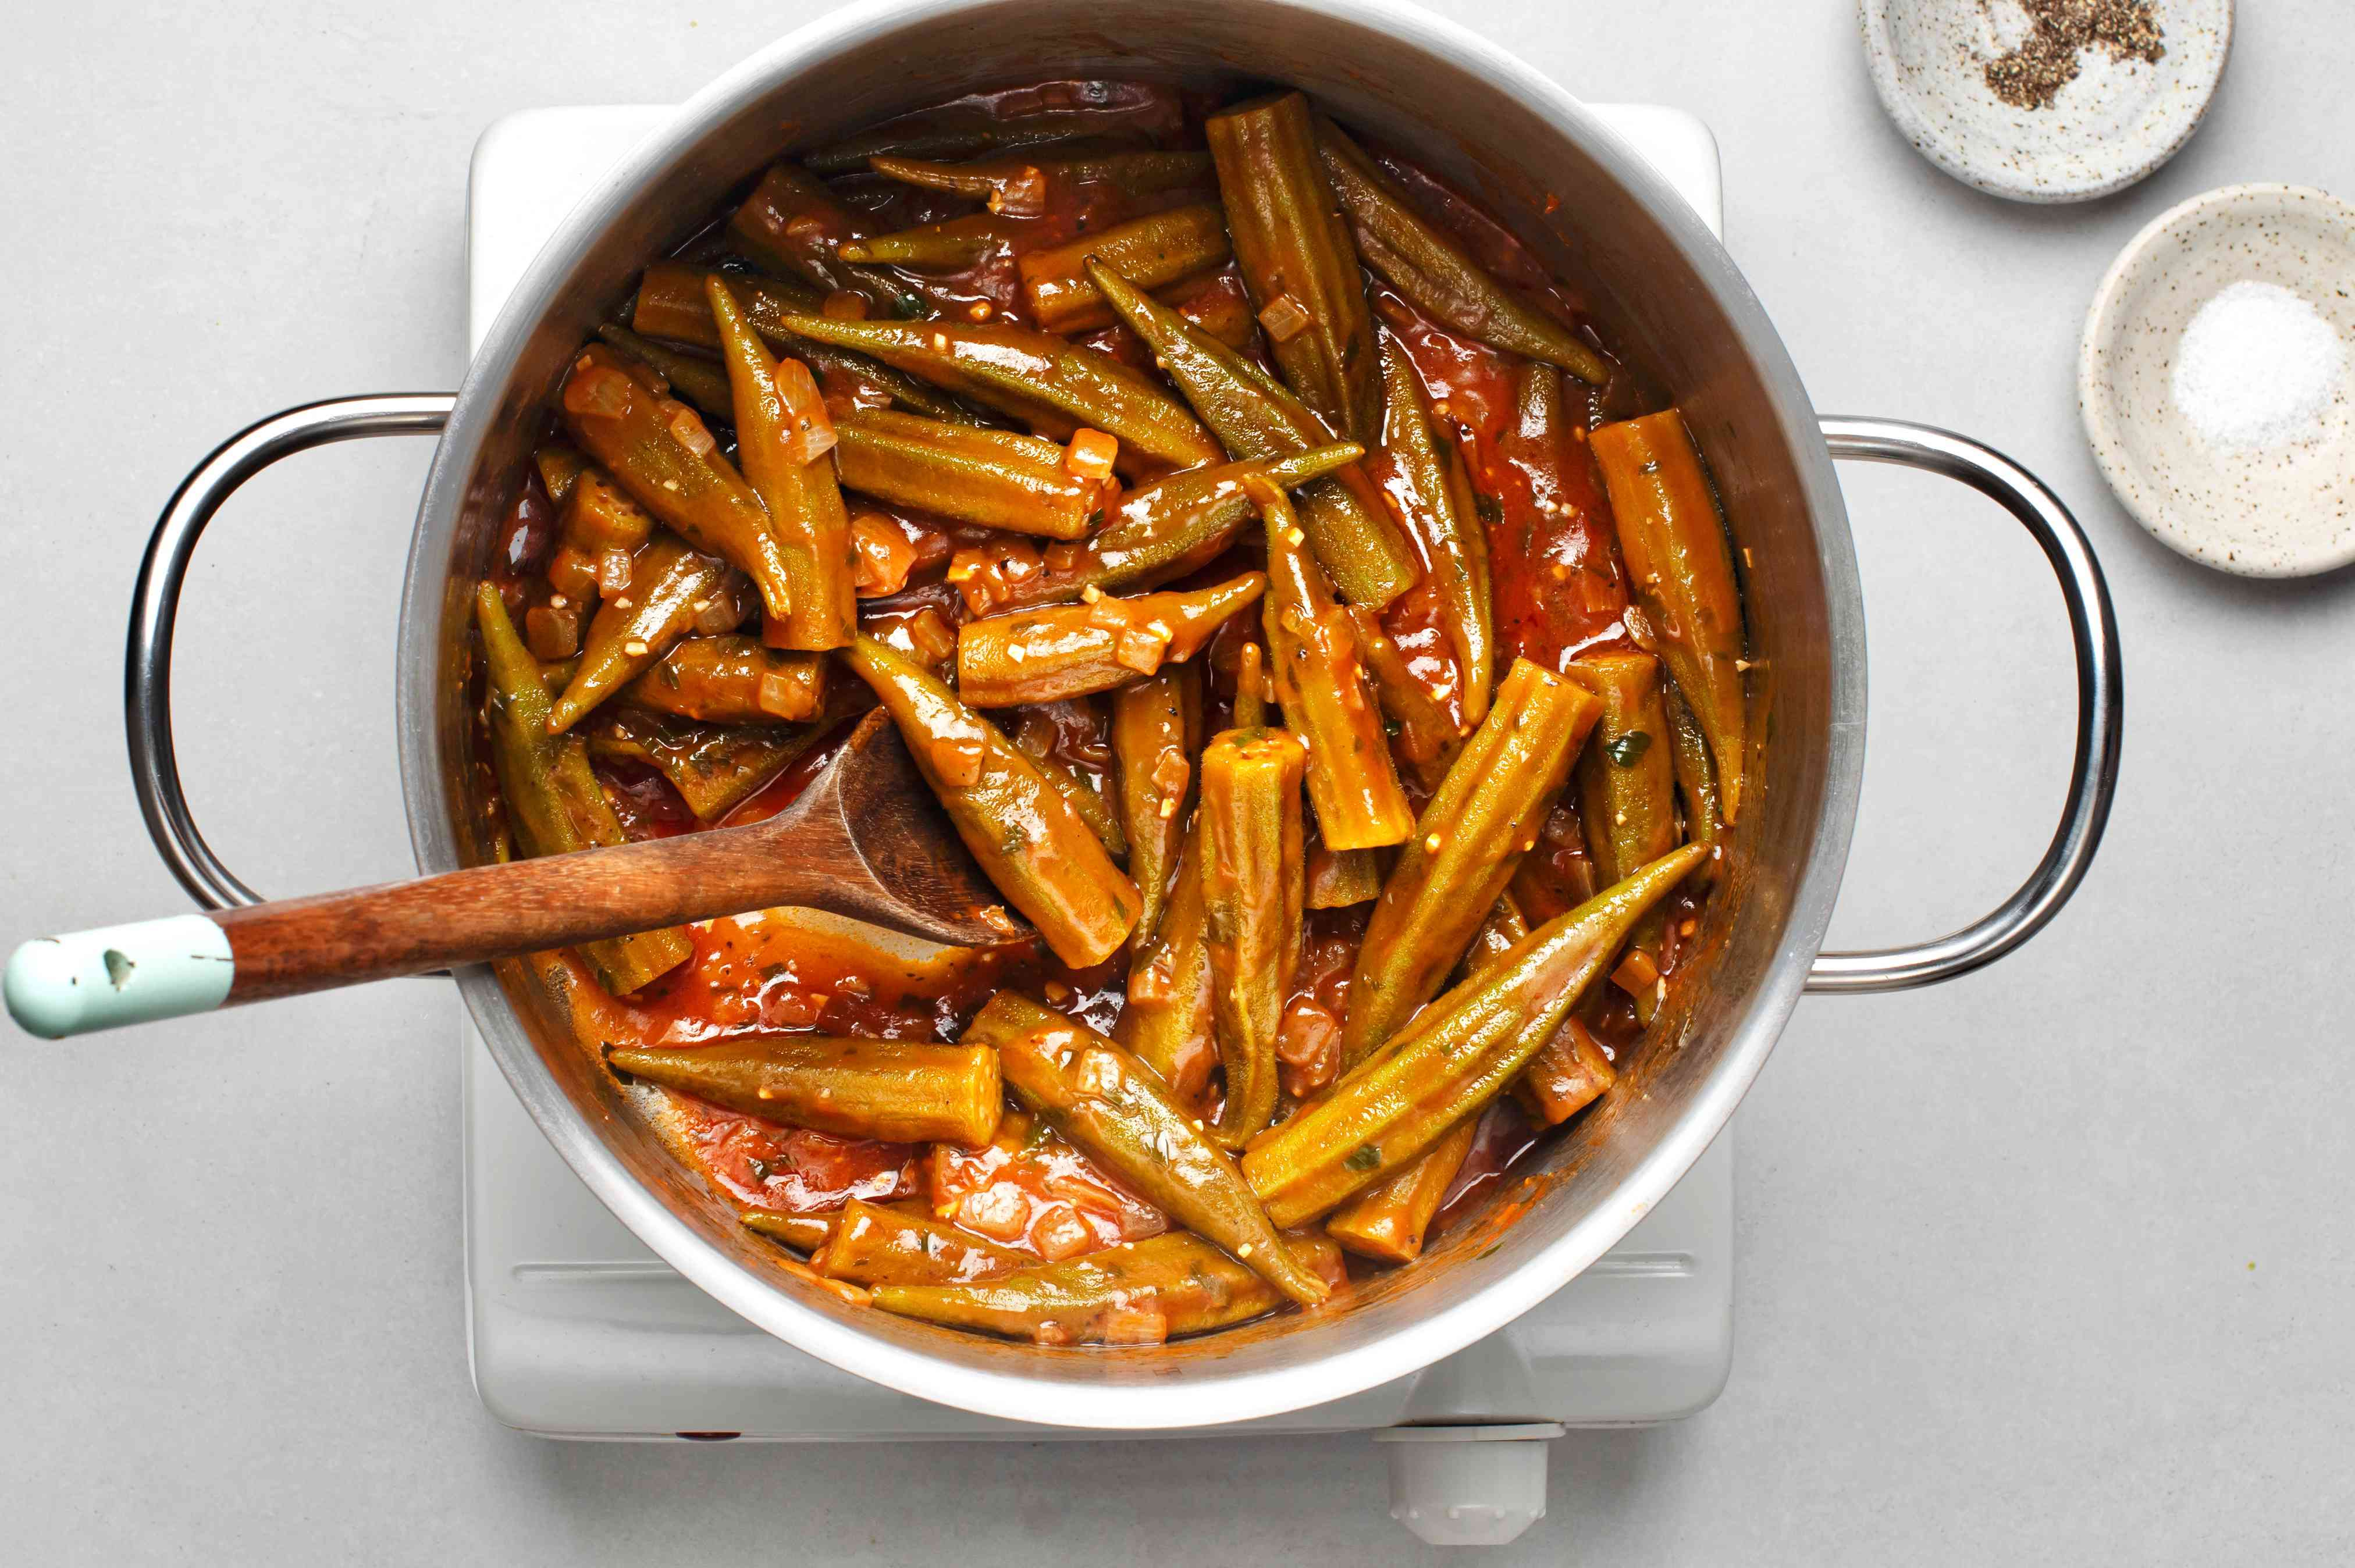 Bamies Latheres me Domata: Stewed Okra in Tomato Sauce in a pot